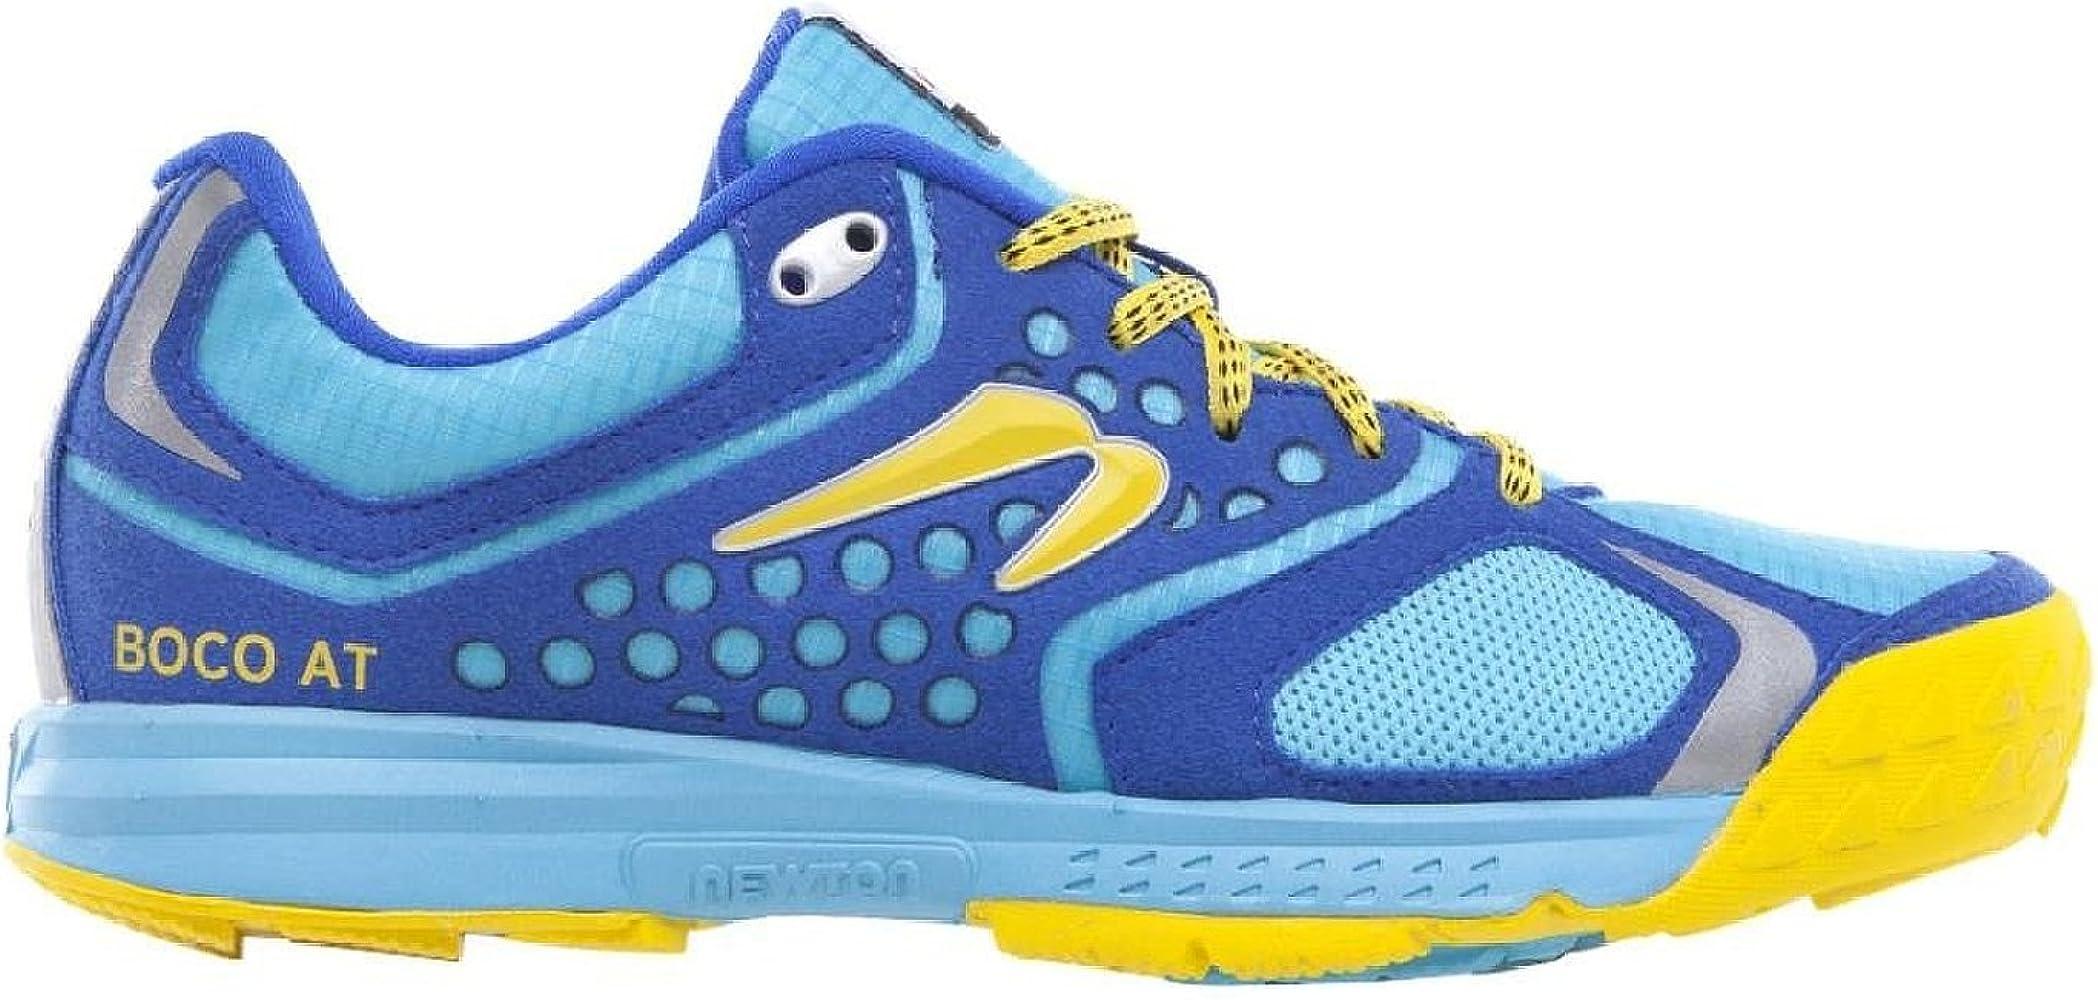 Newton boco All Terrain Zapatillas de Running para Mujer: Amazon ...